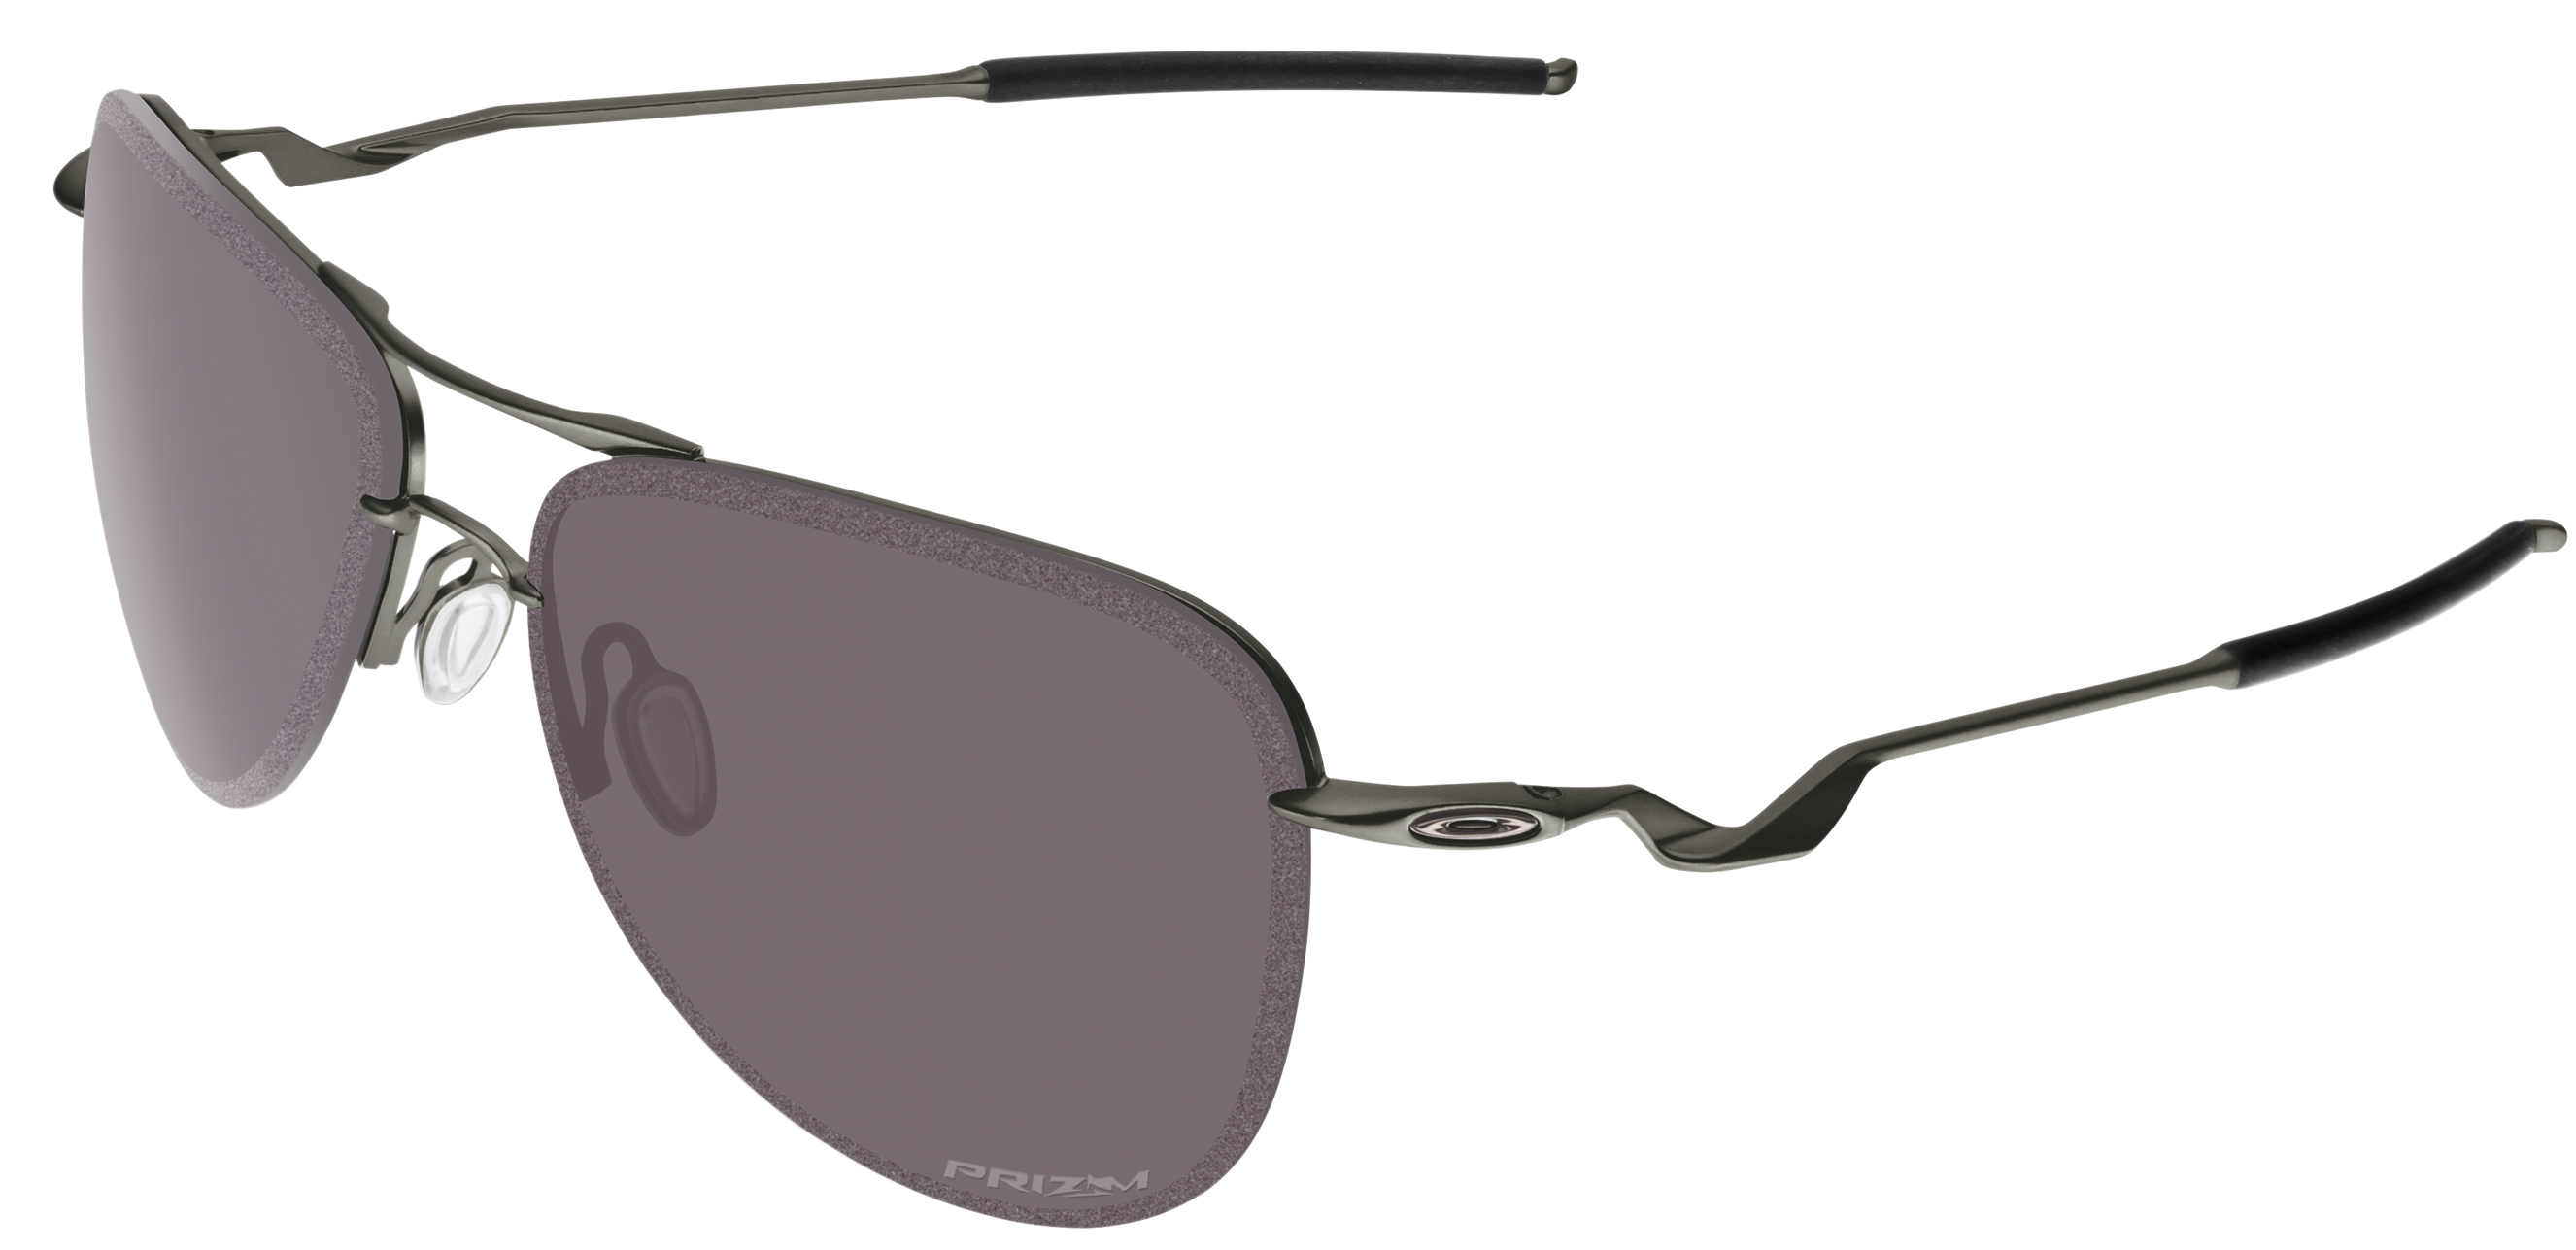 36f7a9ded8 Oakley Tailpin Sunglasses - Unisex